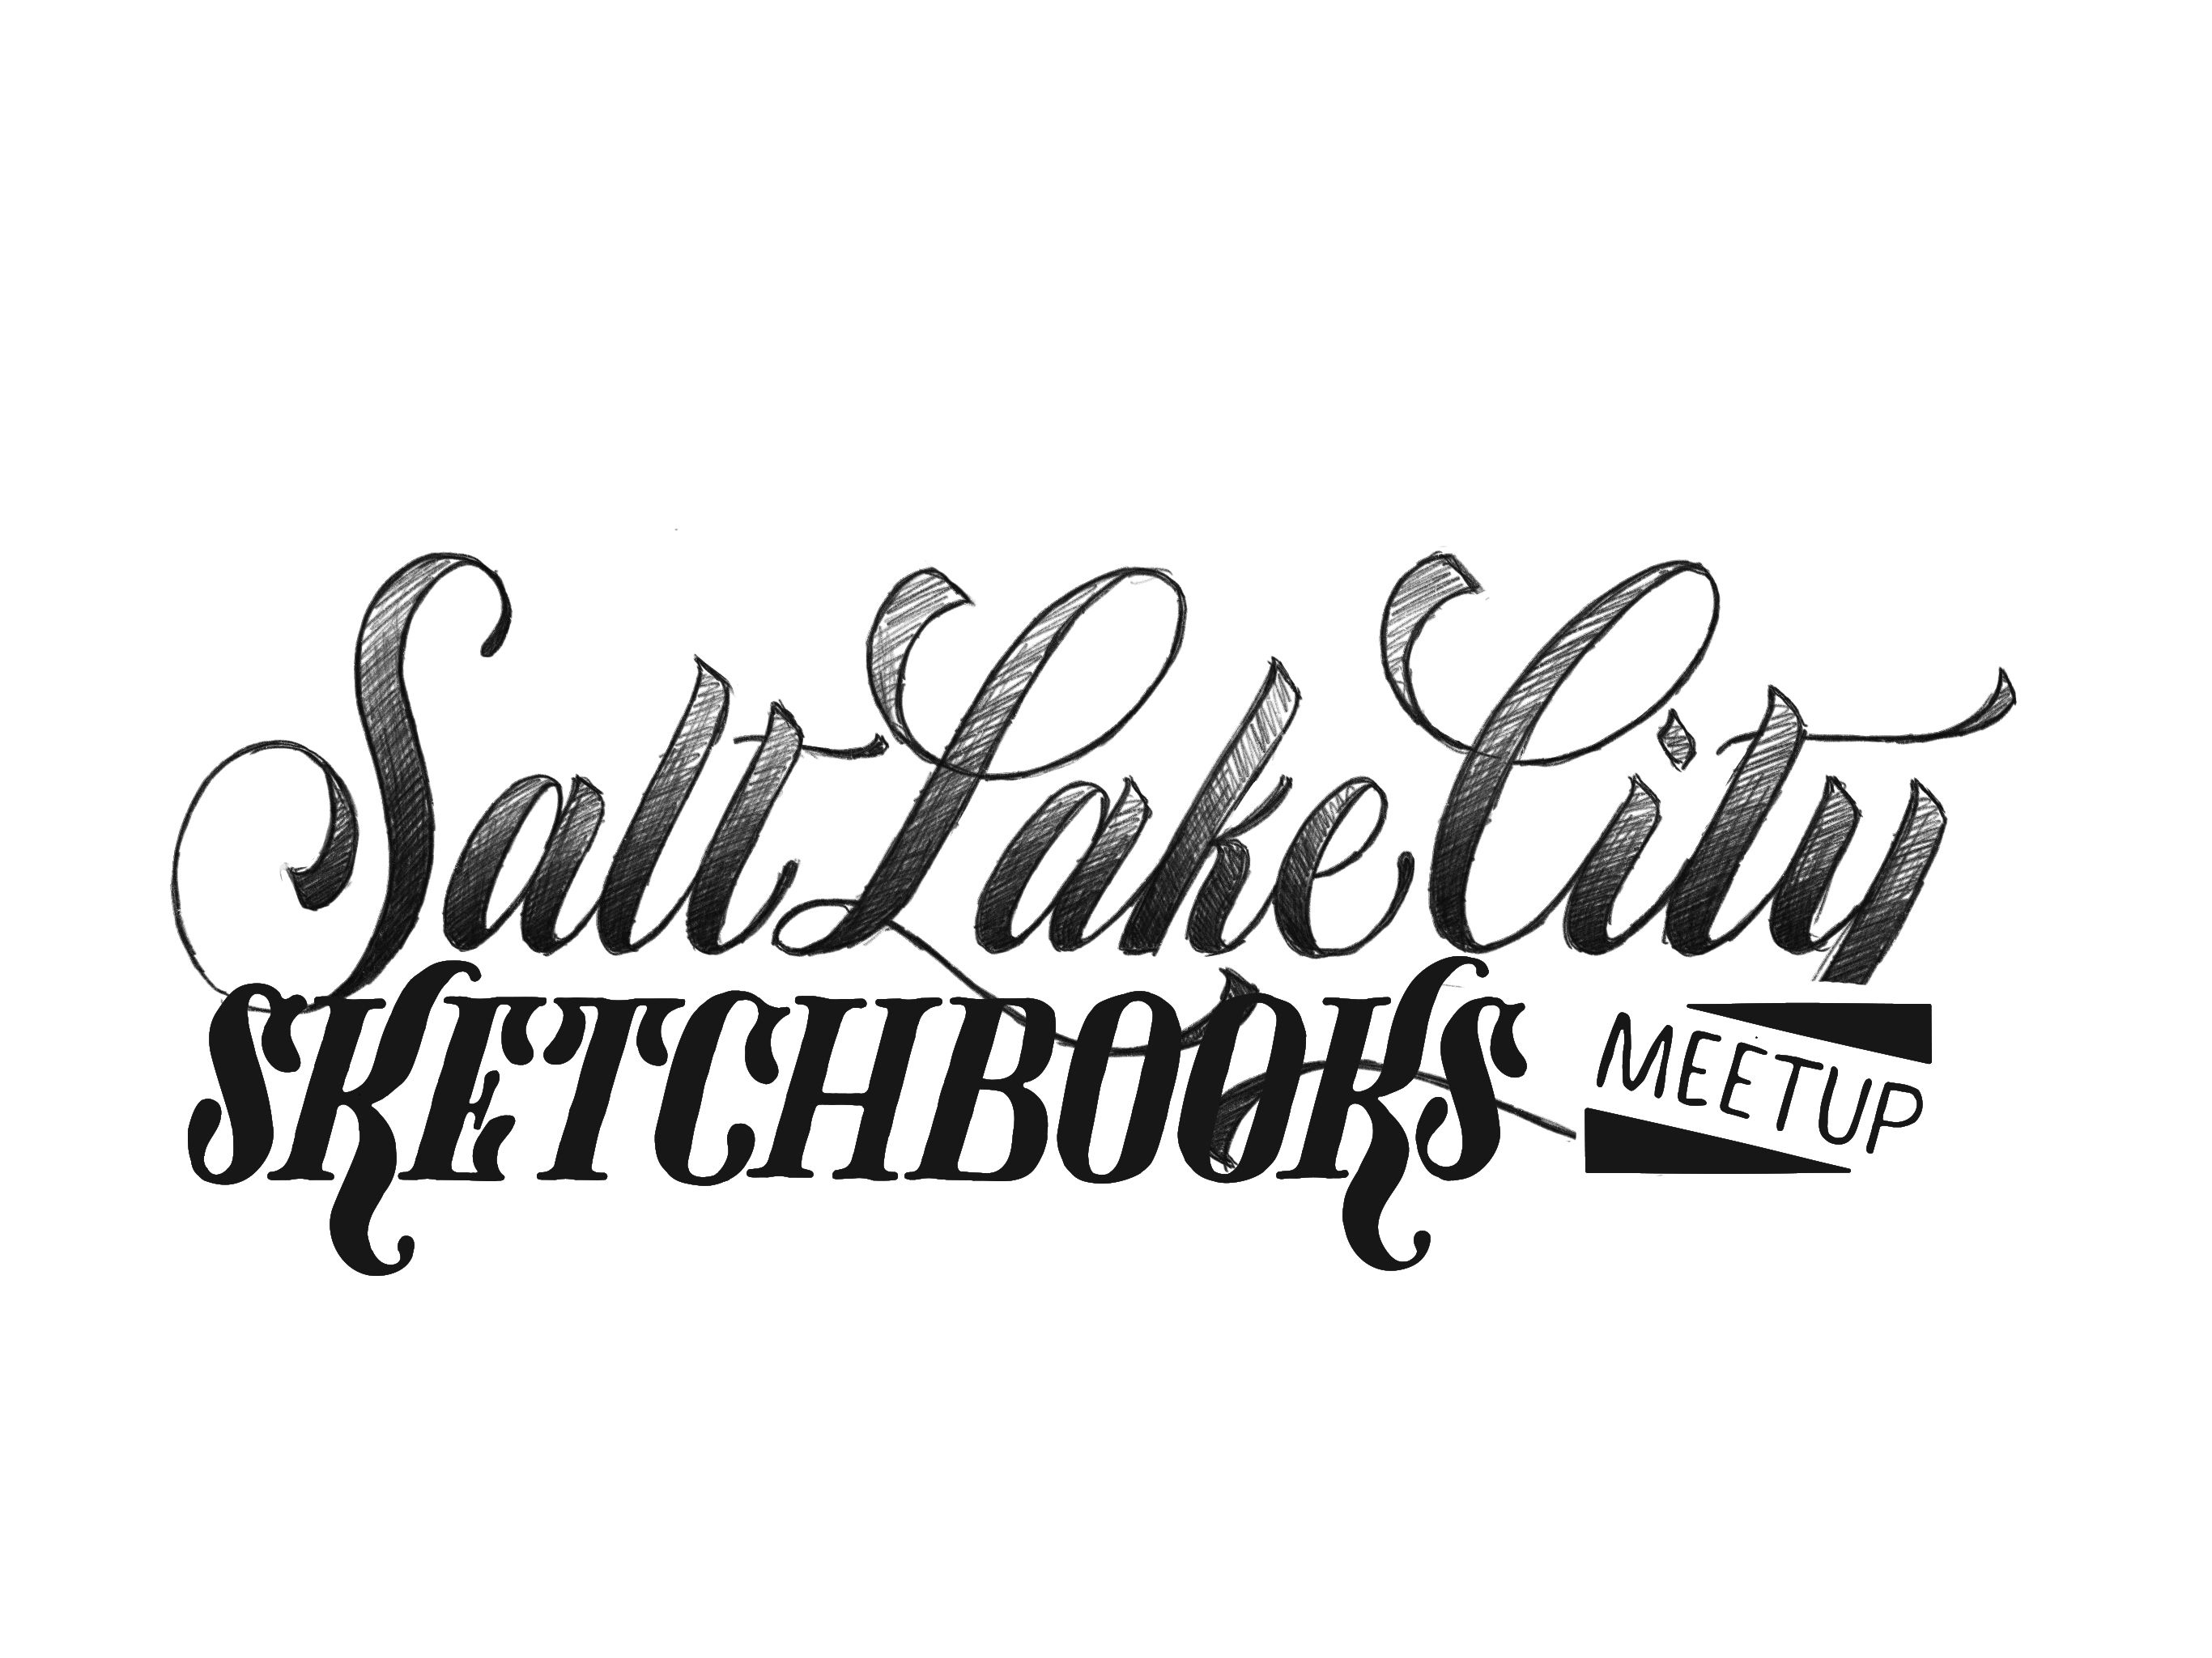 Salt Lake City Sketchbooks